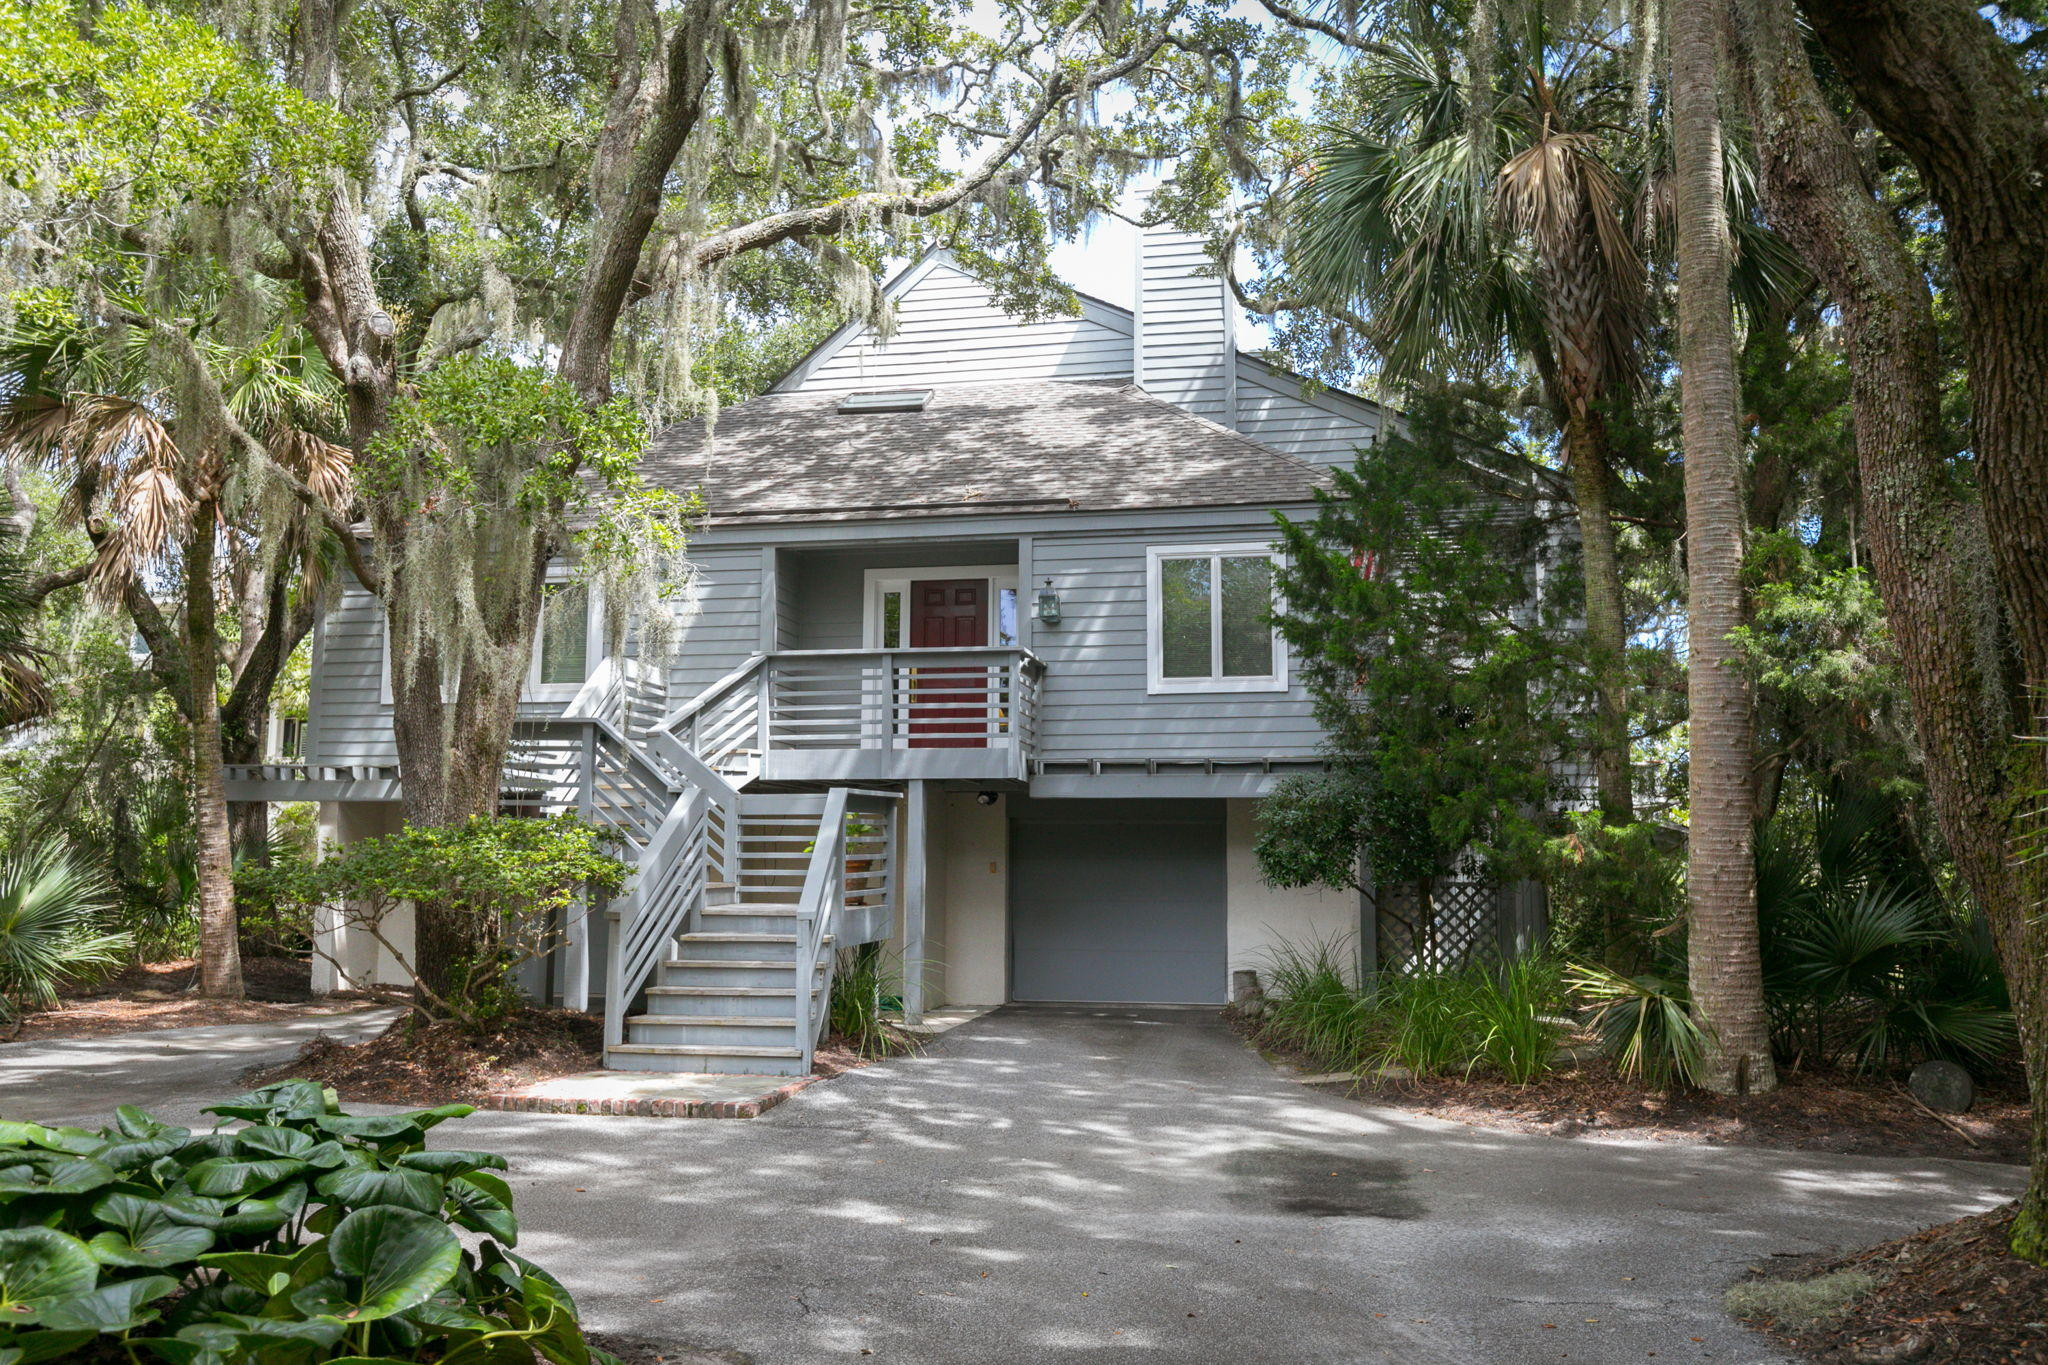 Seabrook Island Homes For Sale - 3360 Seabrook Island, Seabrook Island, SC - 19